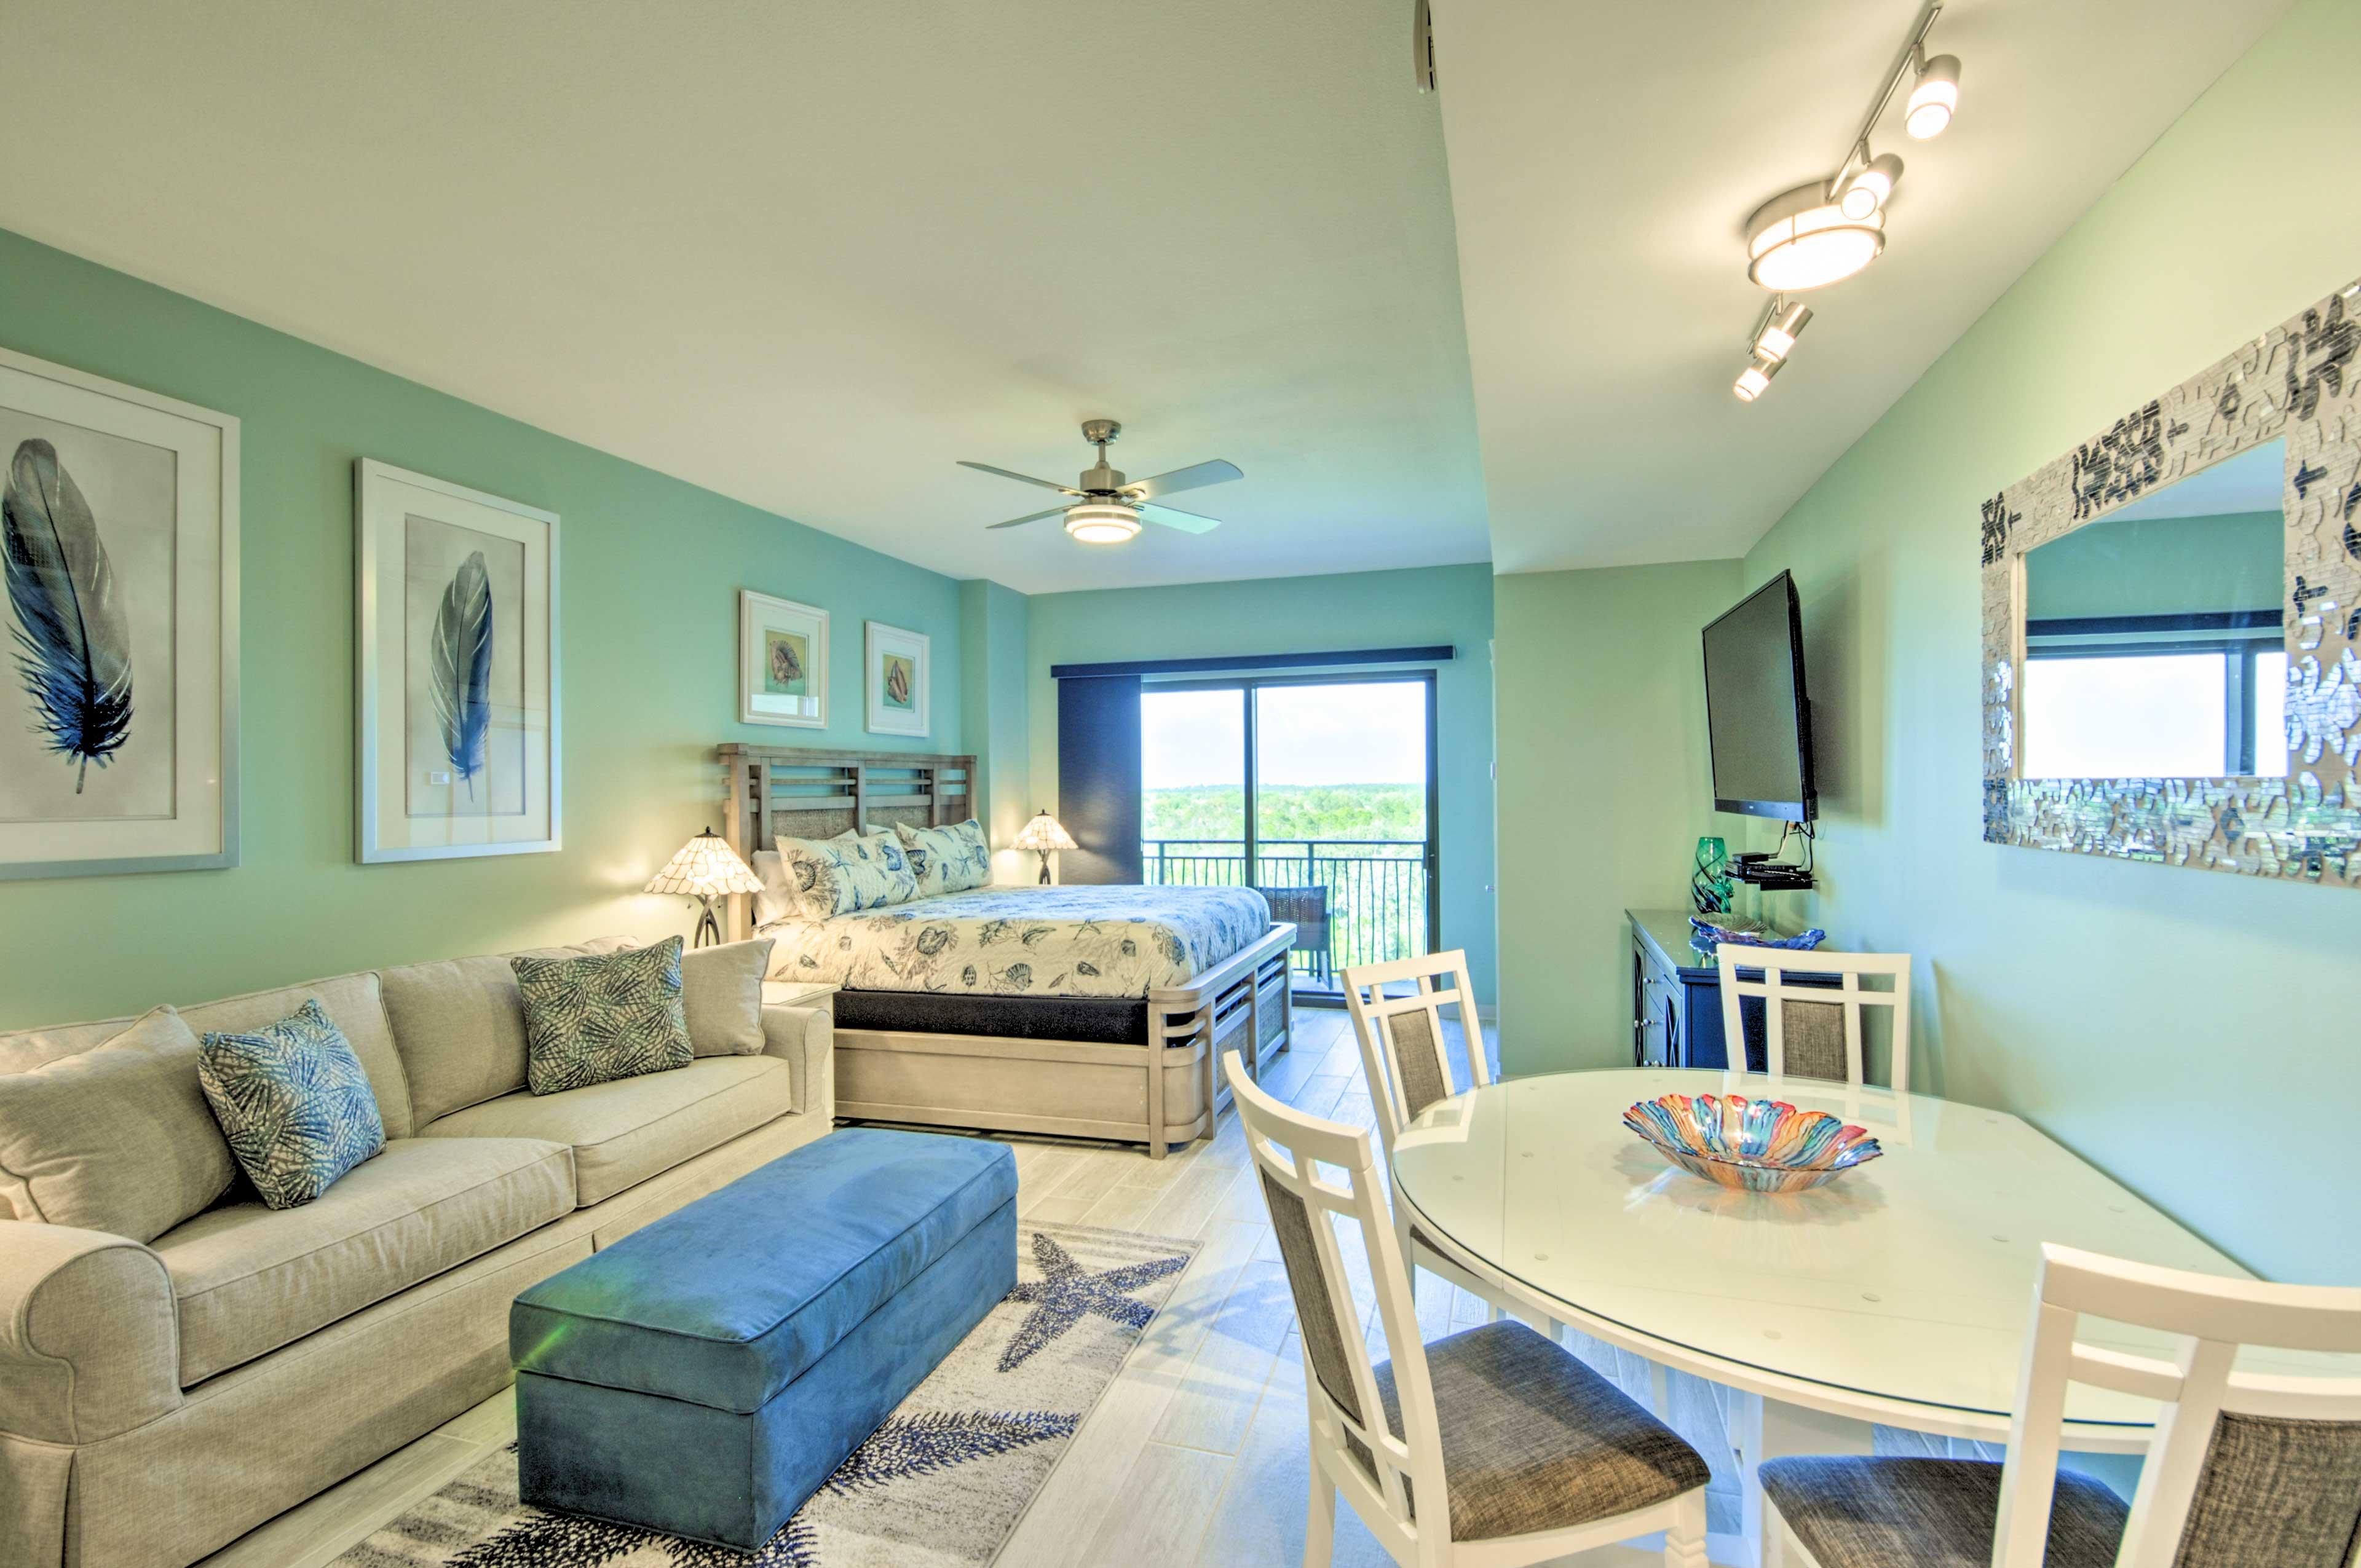 Panama City Beach Vacation Rental | Studio | 1BA | 475 Sq Ft | 6th Floor